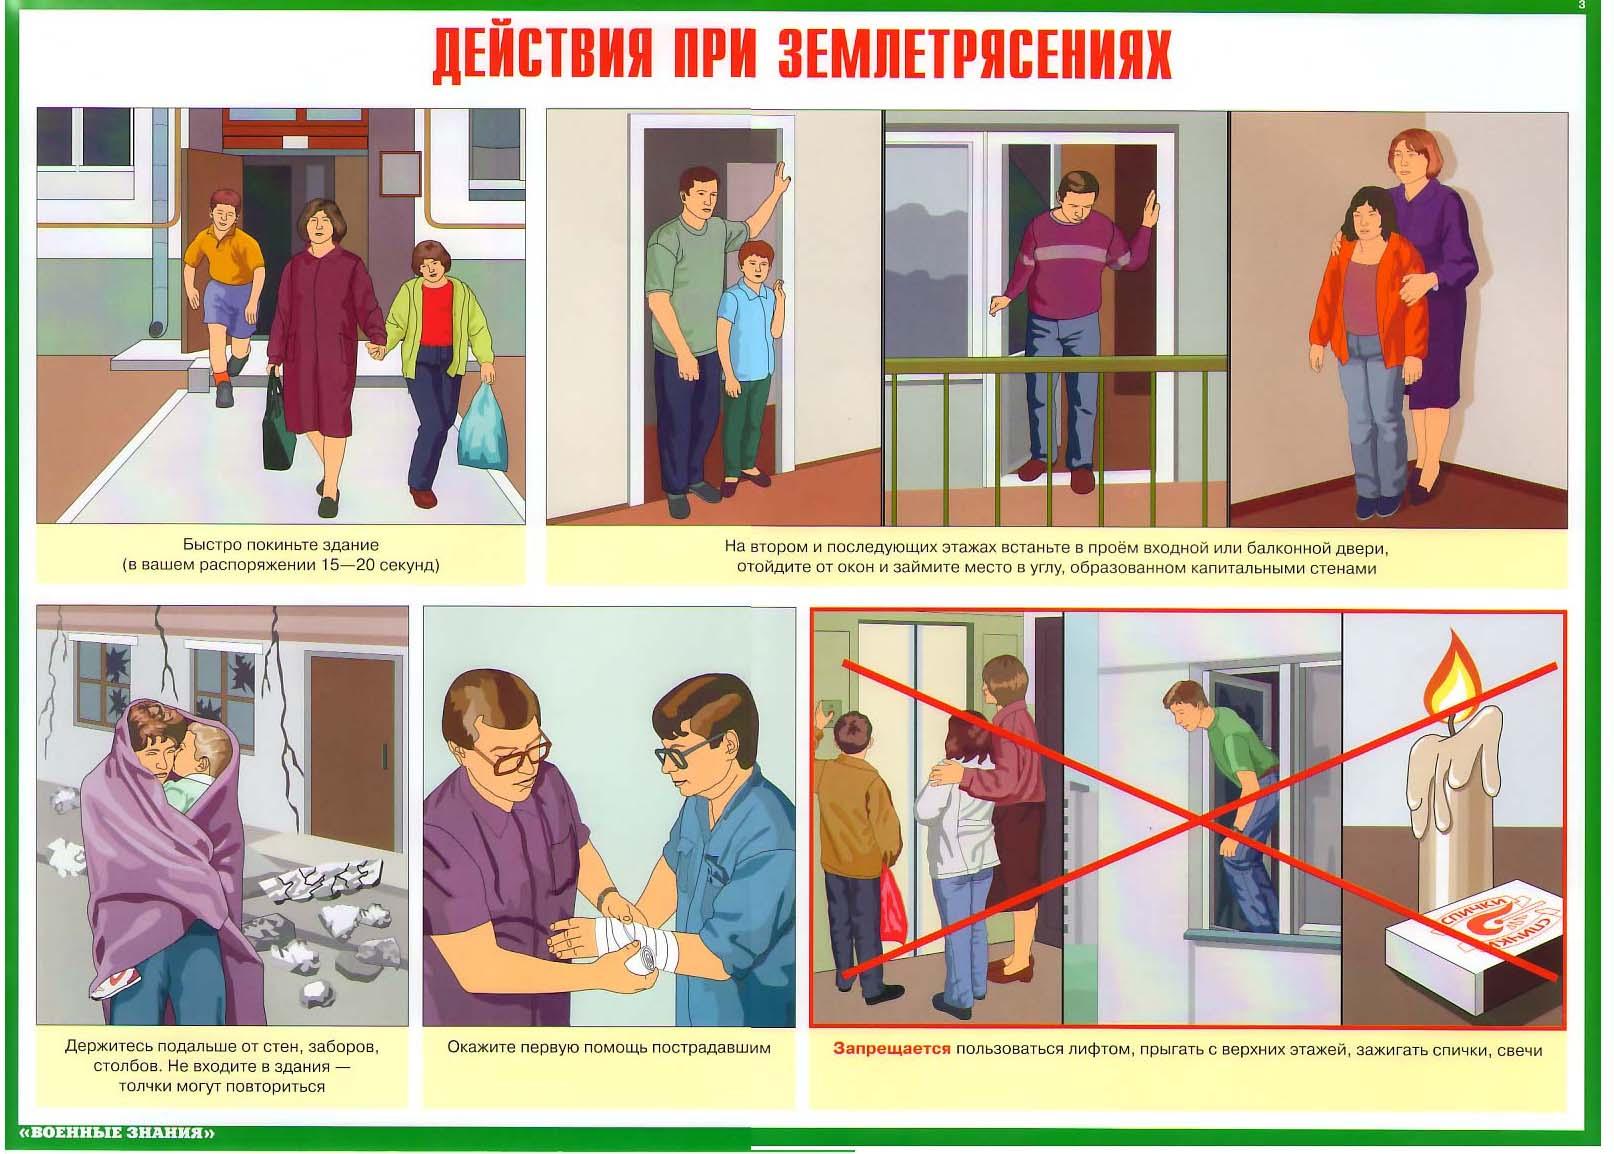 Действия населения при землетрясении